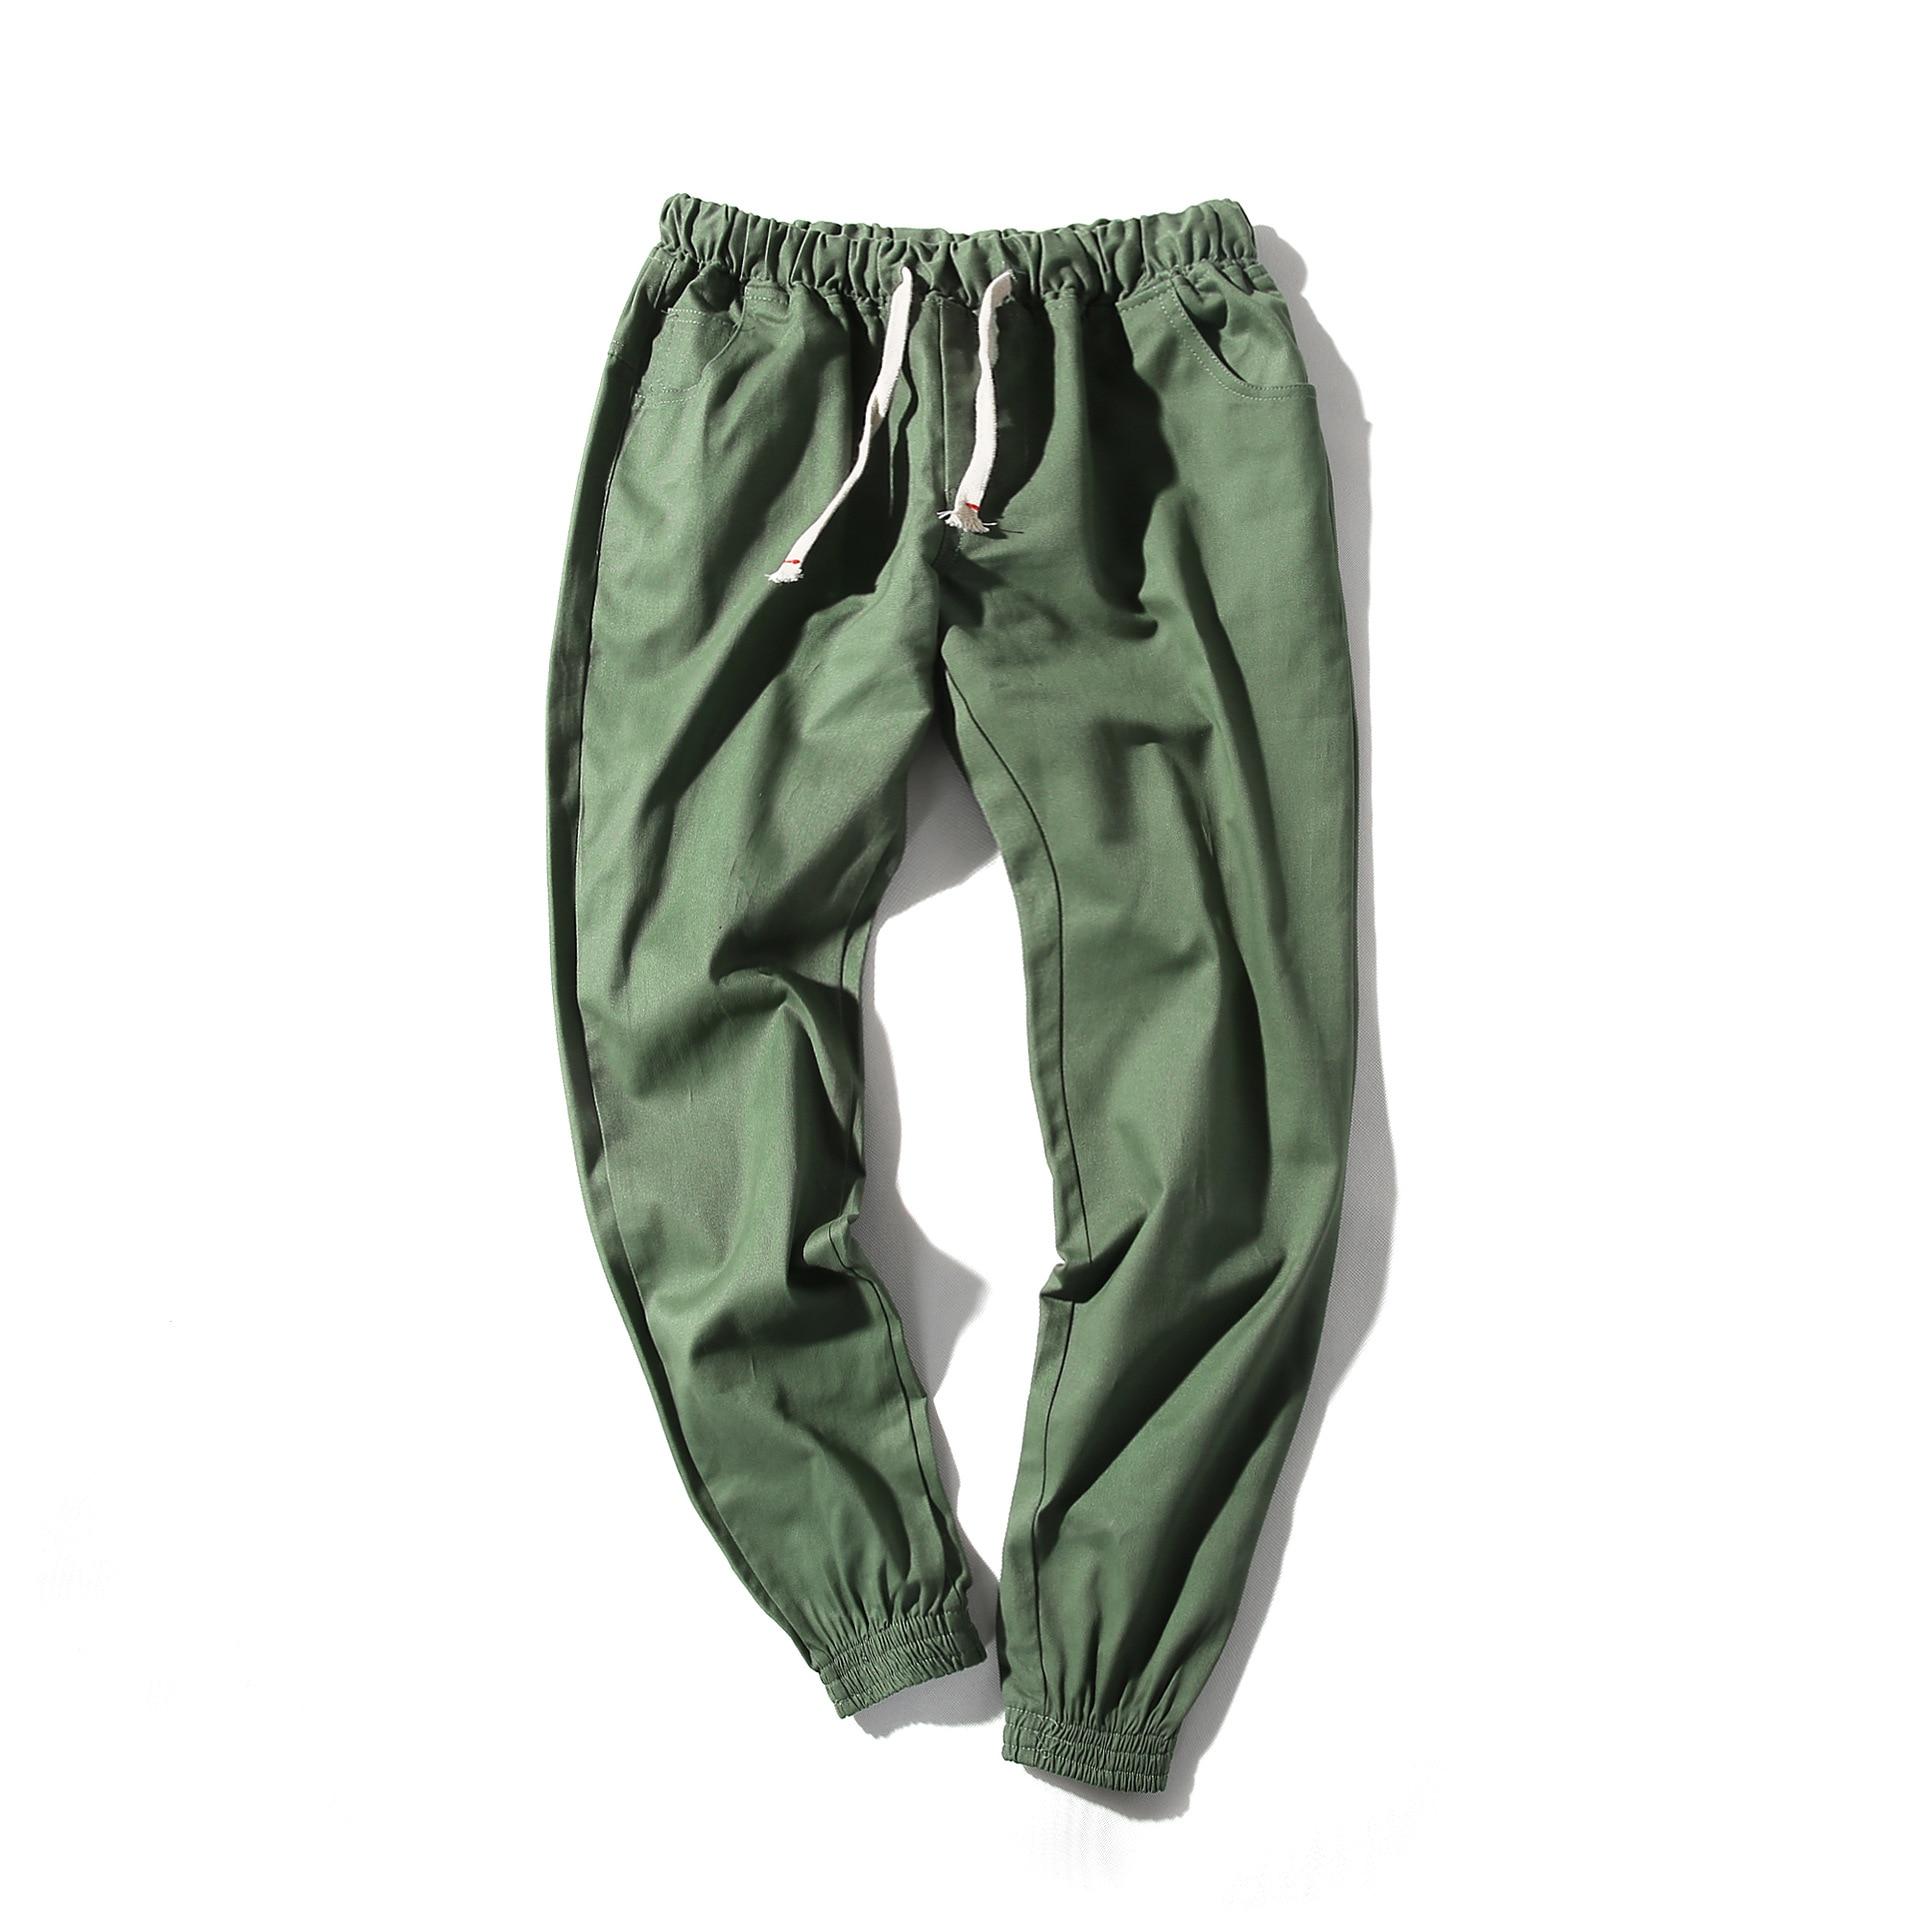 MEN'S WEAR Korean-style Hot Selling Casual Pants Men Harem Solid Color Sports Ninth Pants Large Size 5XL Customizable